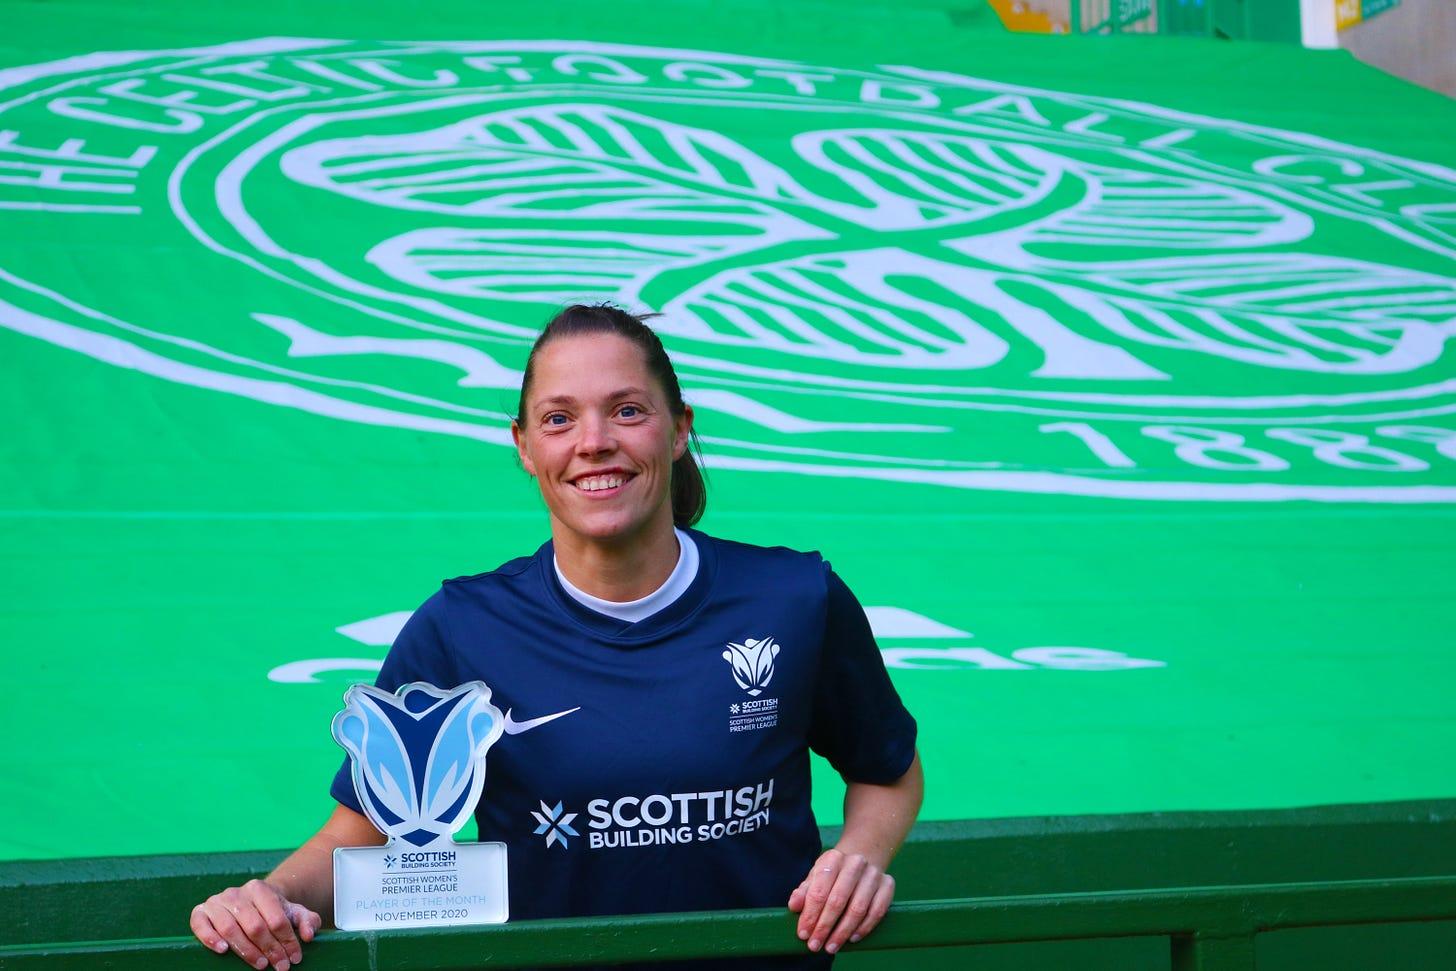 Lisa Robertson accepting her award at Celtic Park